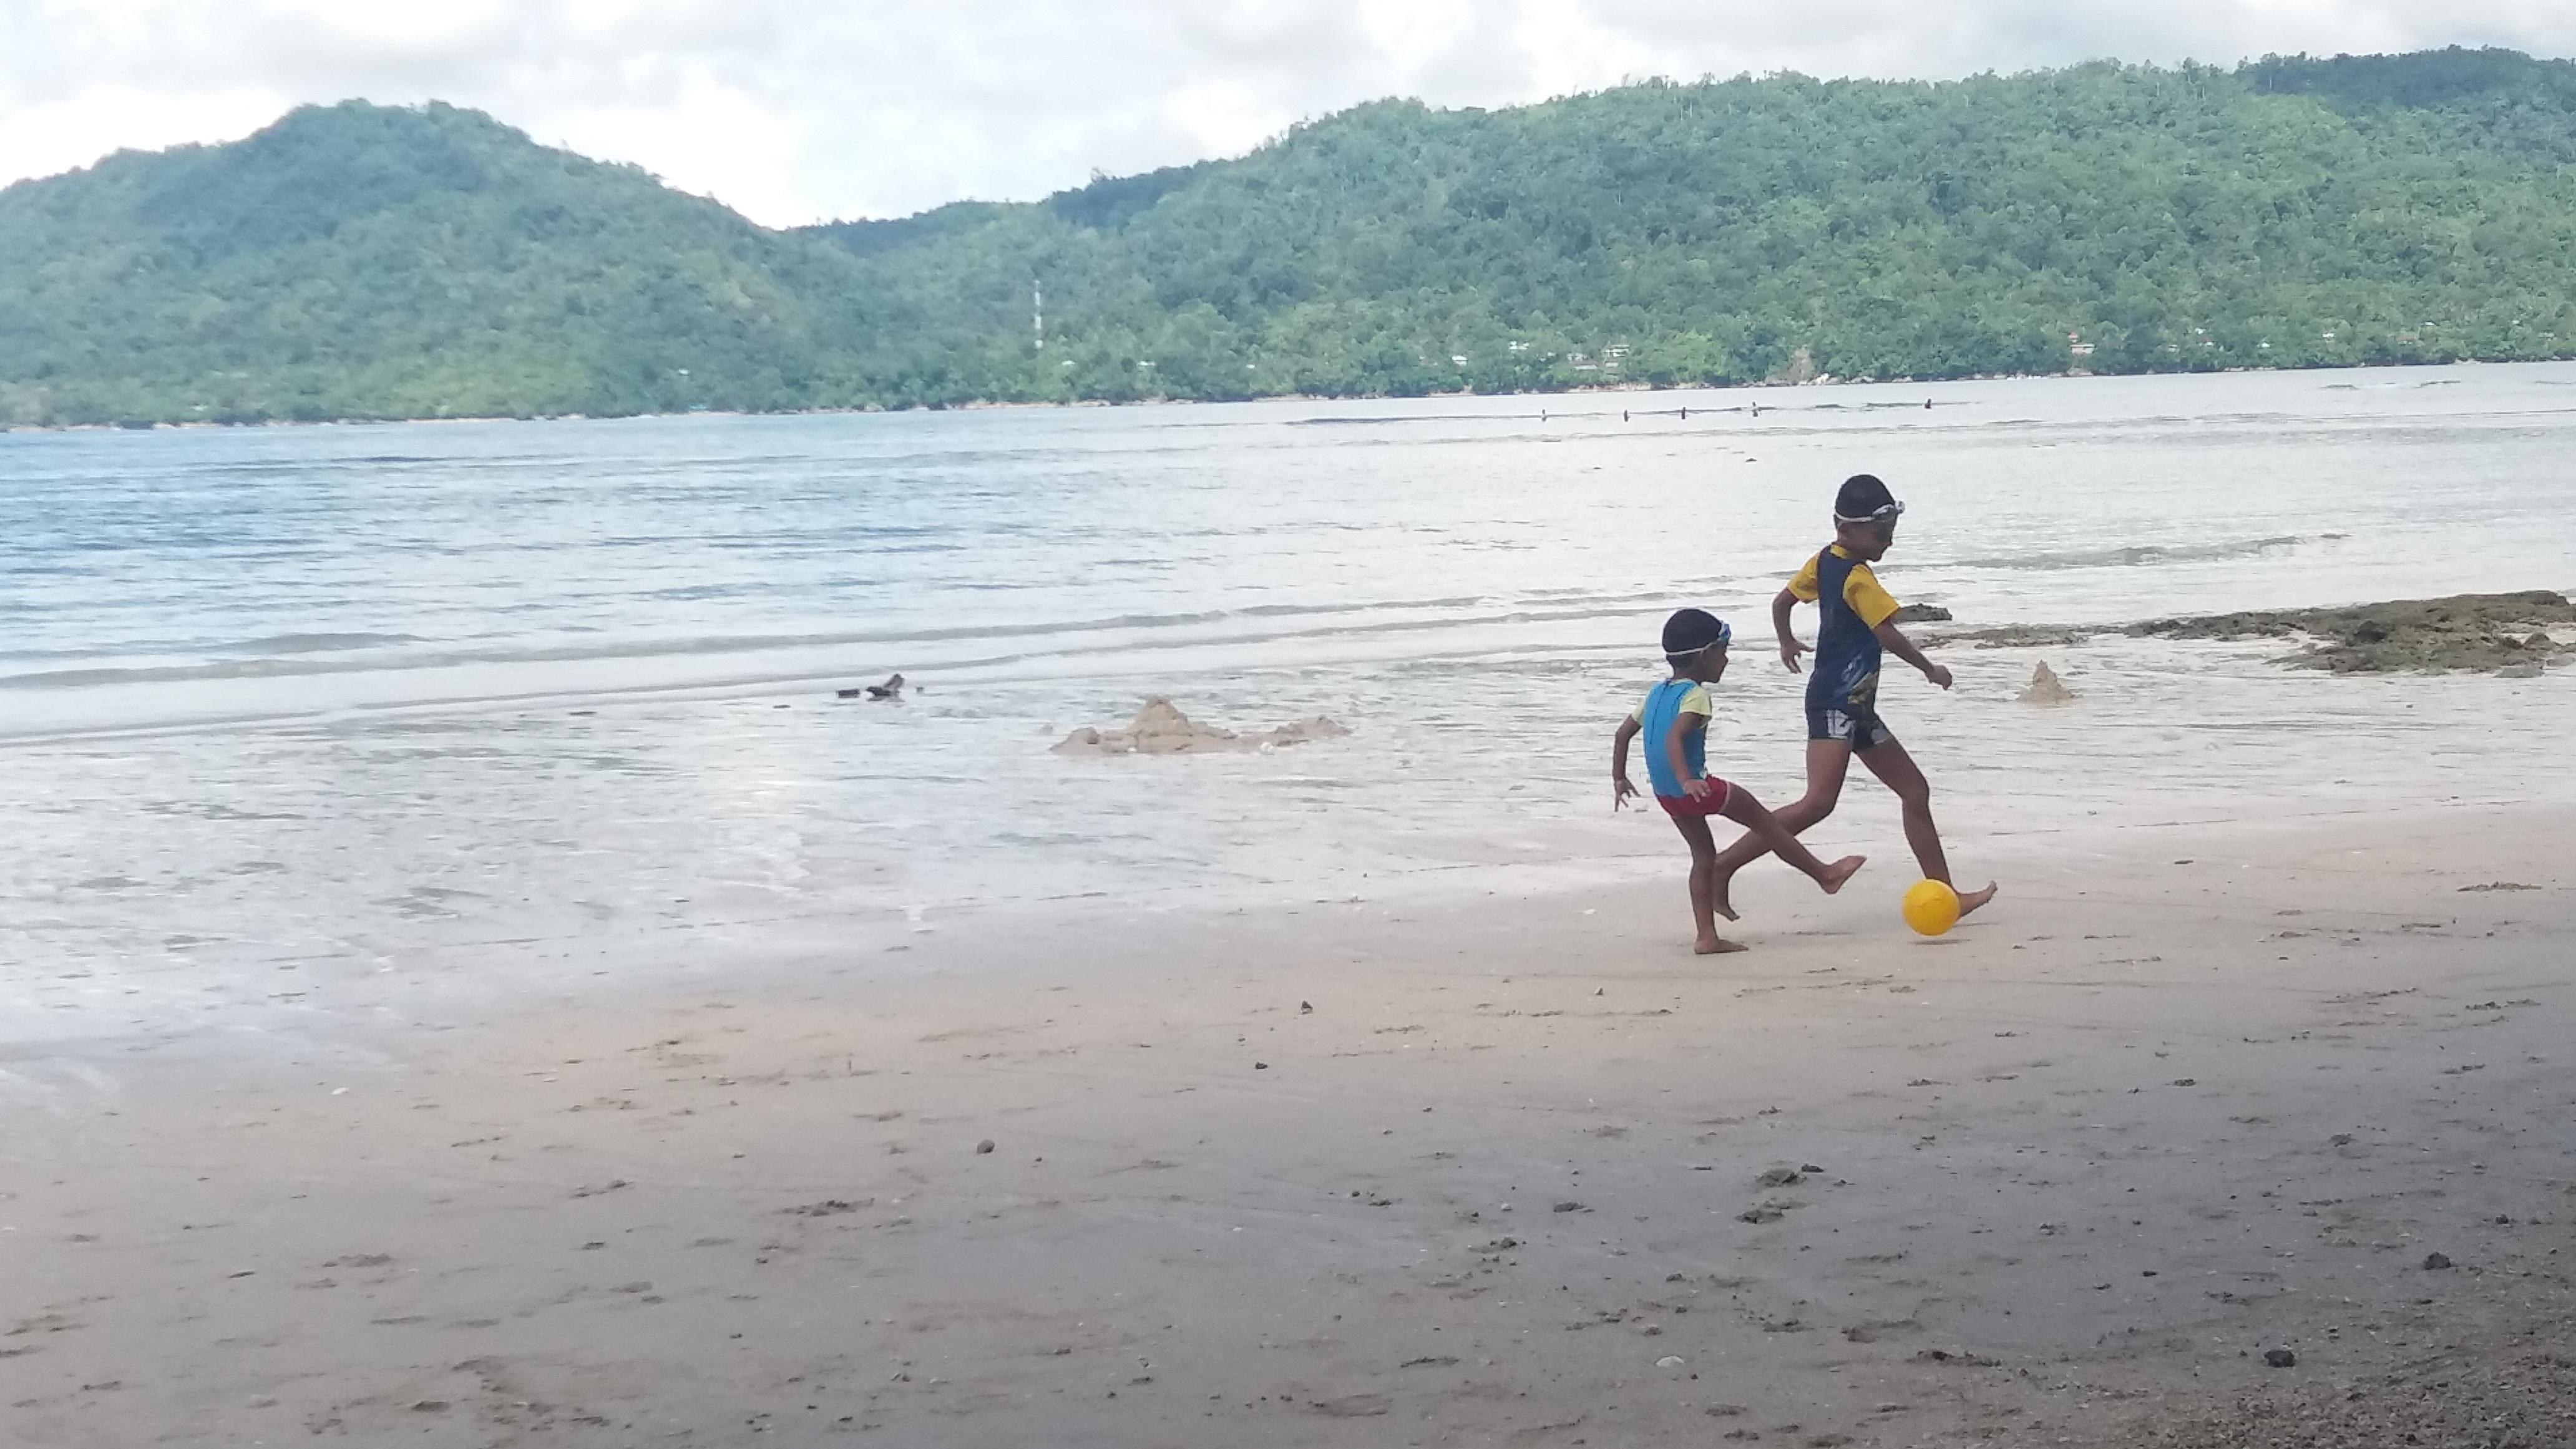 Pantai Sopapei Suli Omwil Punya Gawe Libur Lebaran 2017 Wisata